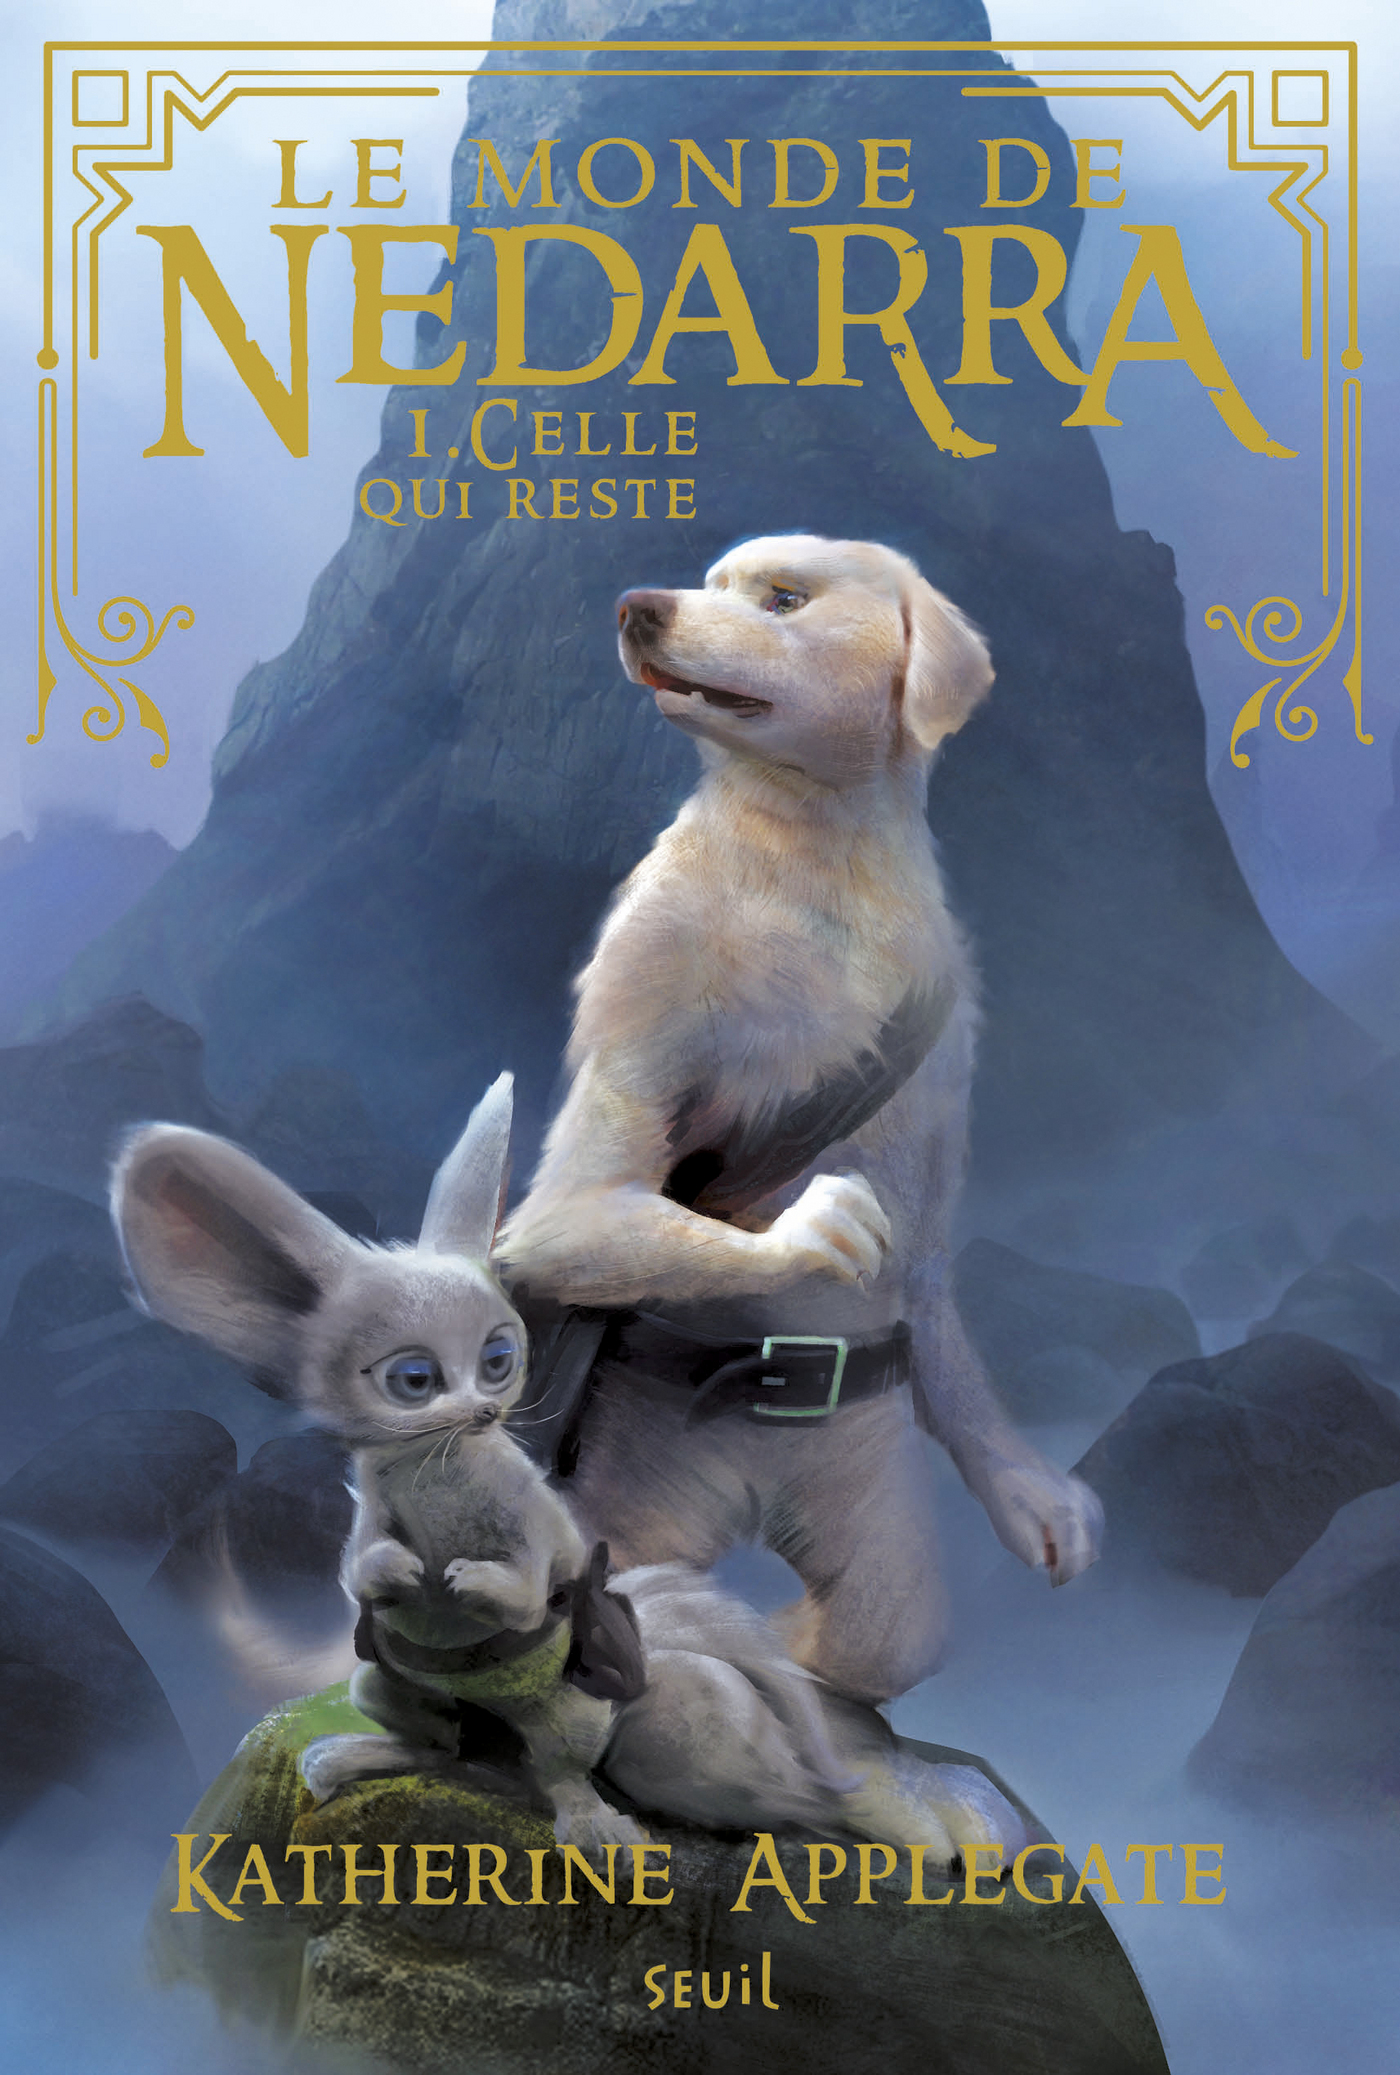 Le monde de Nedarra - tome 1 Celle qui reste